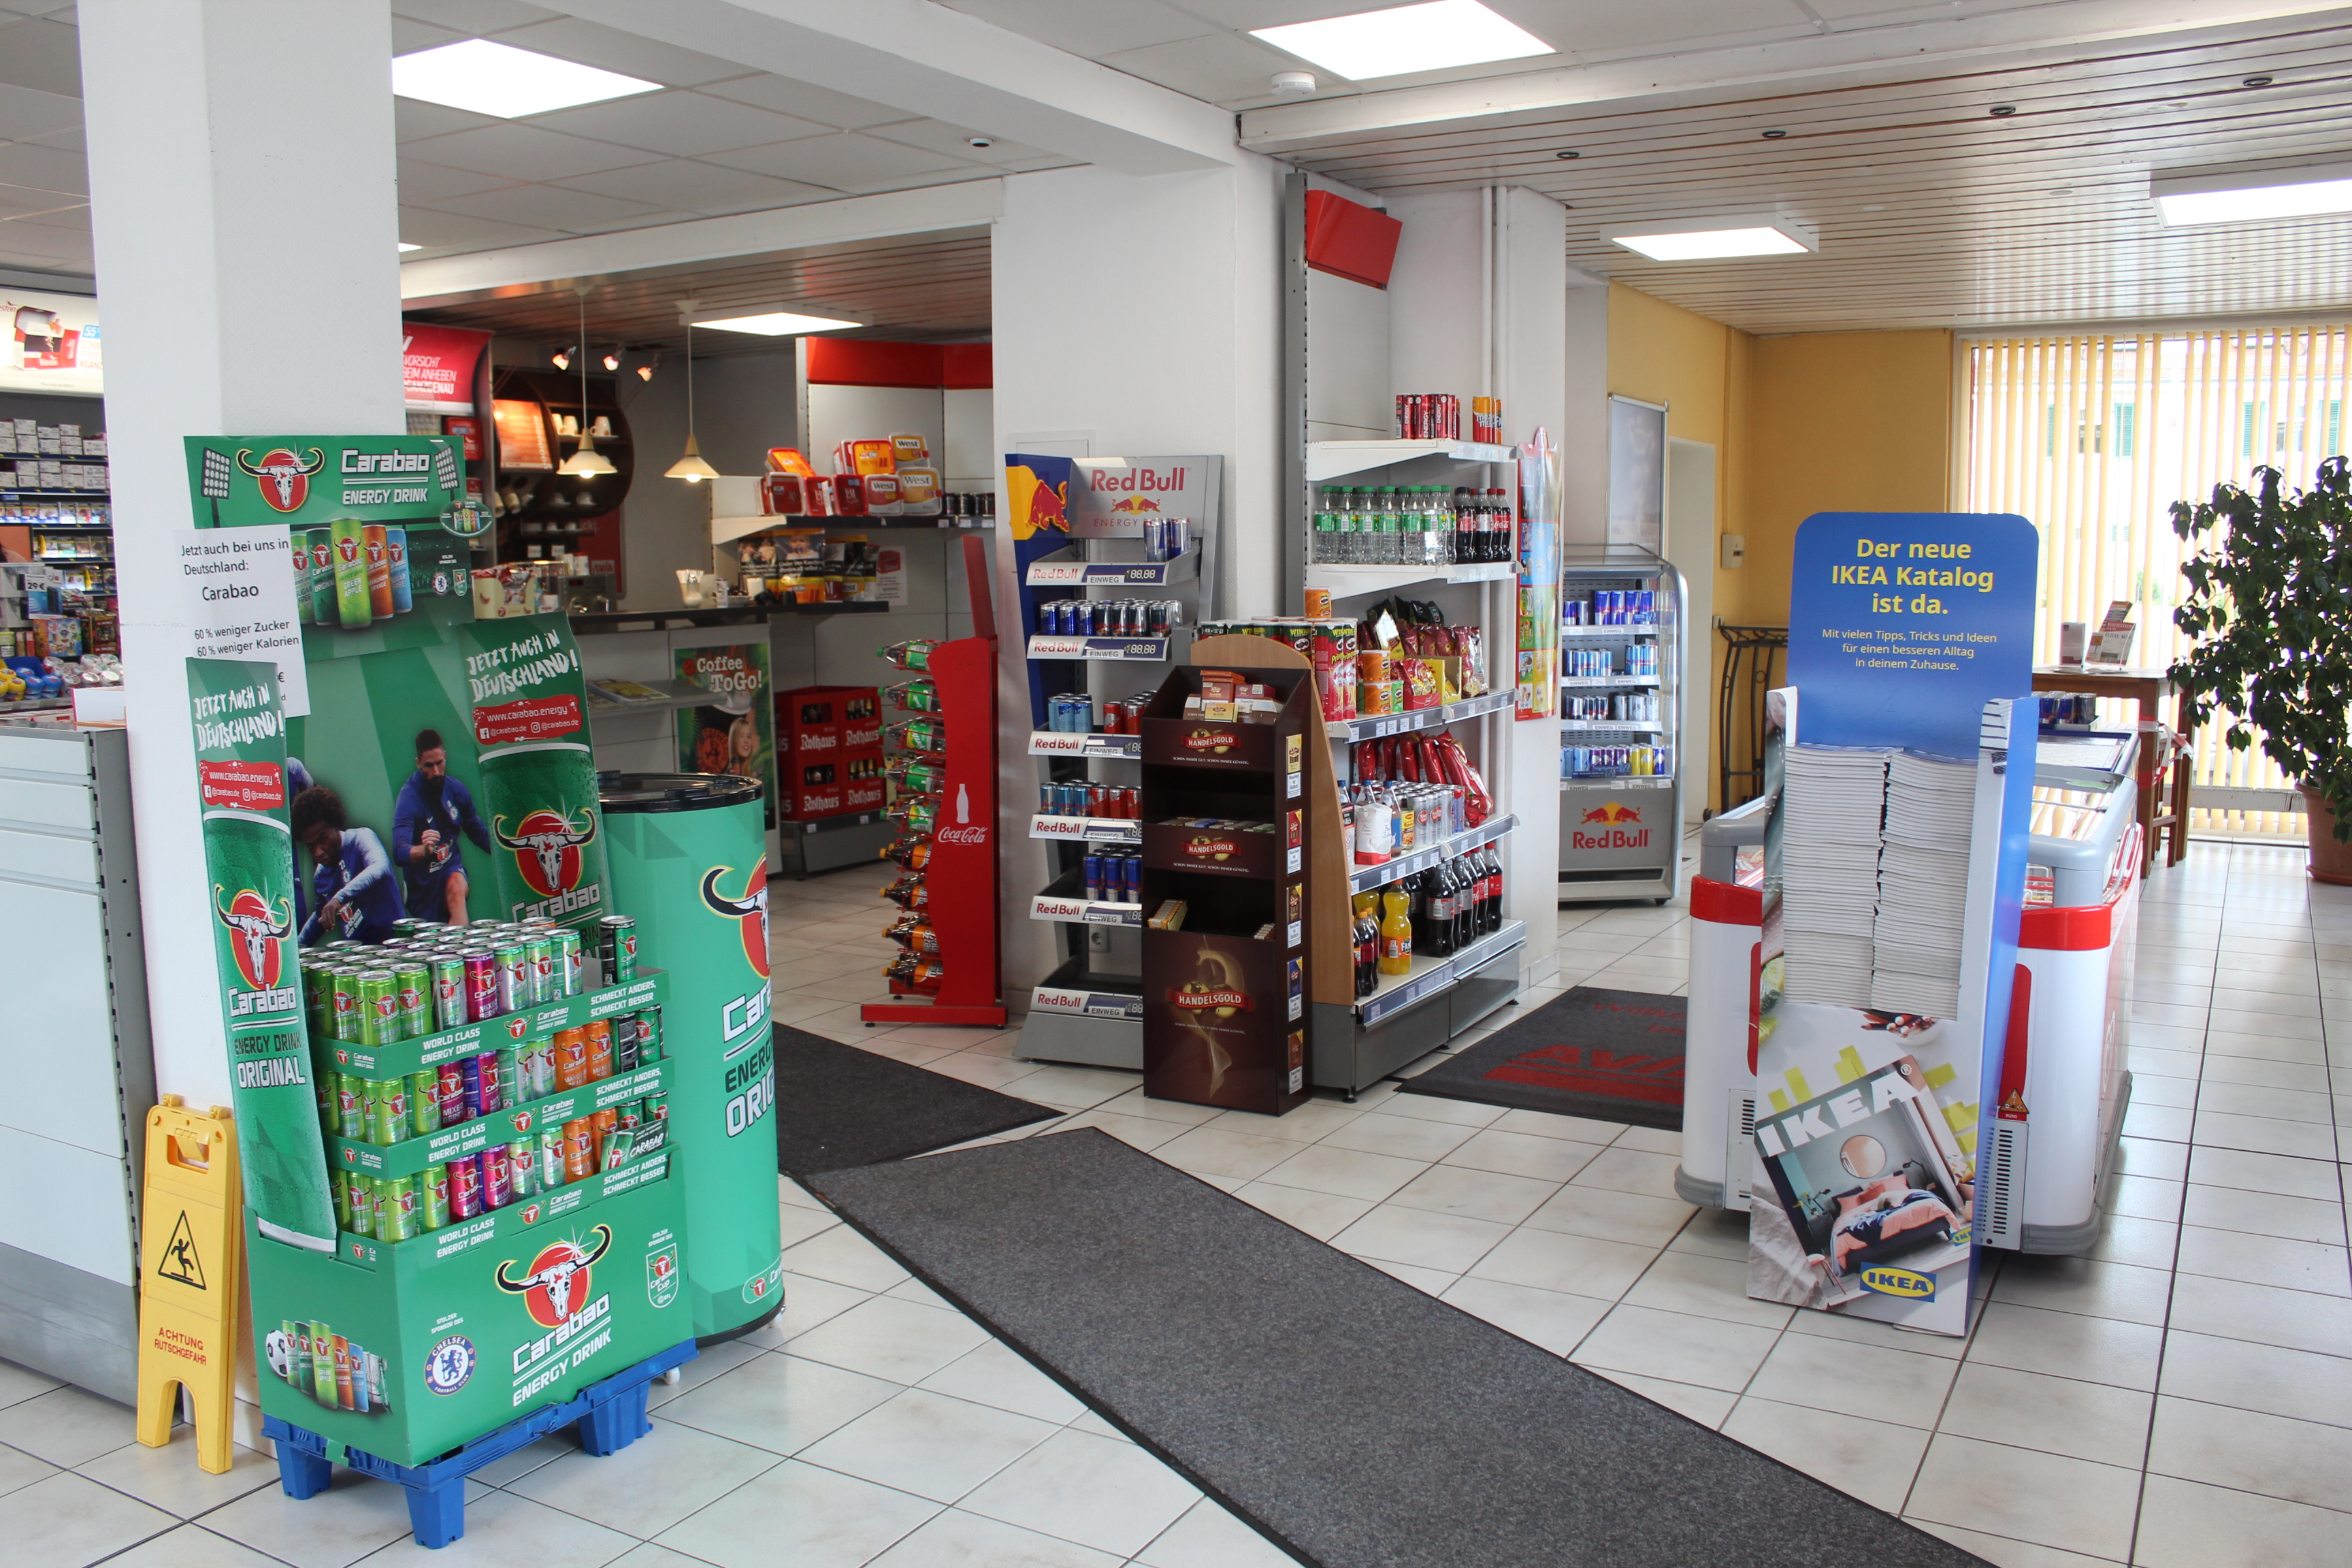 Bild der AVIA Tankstelle Kuppenheim